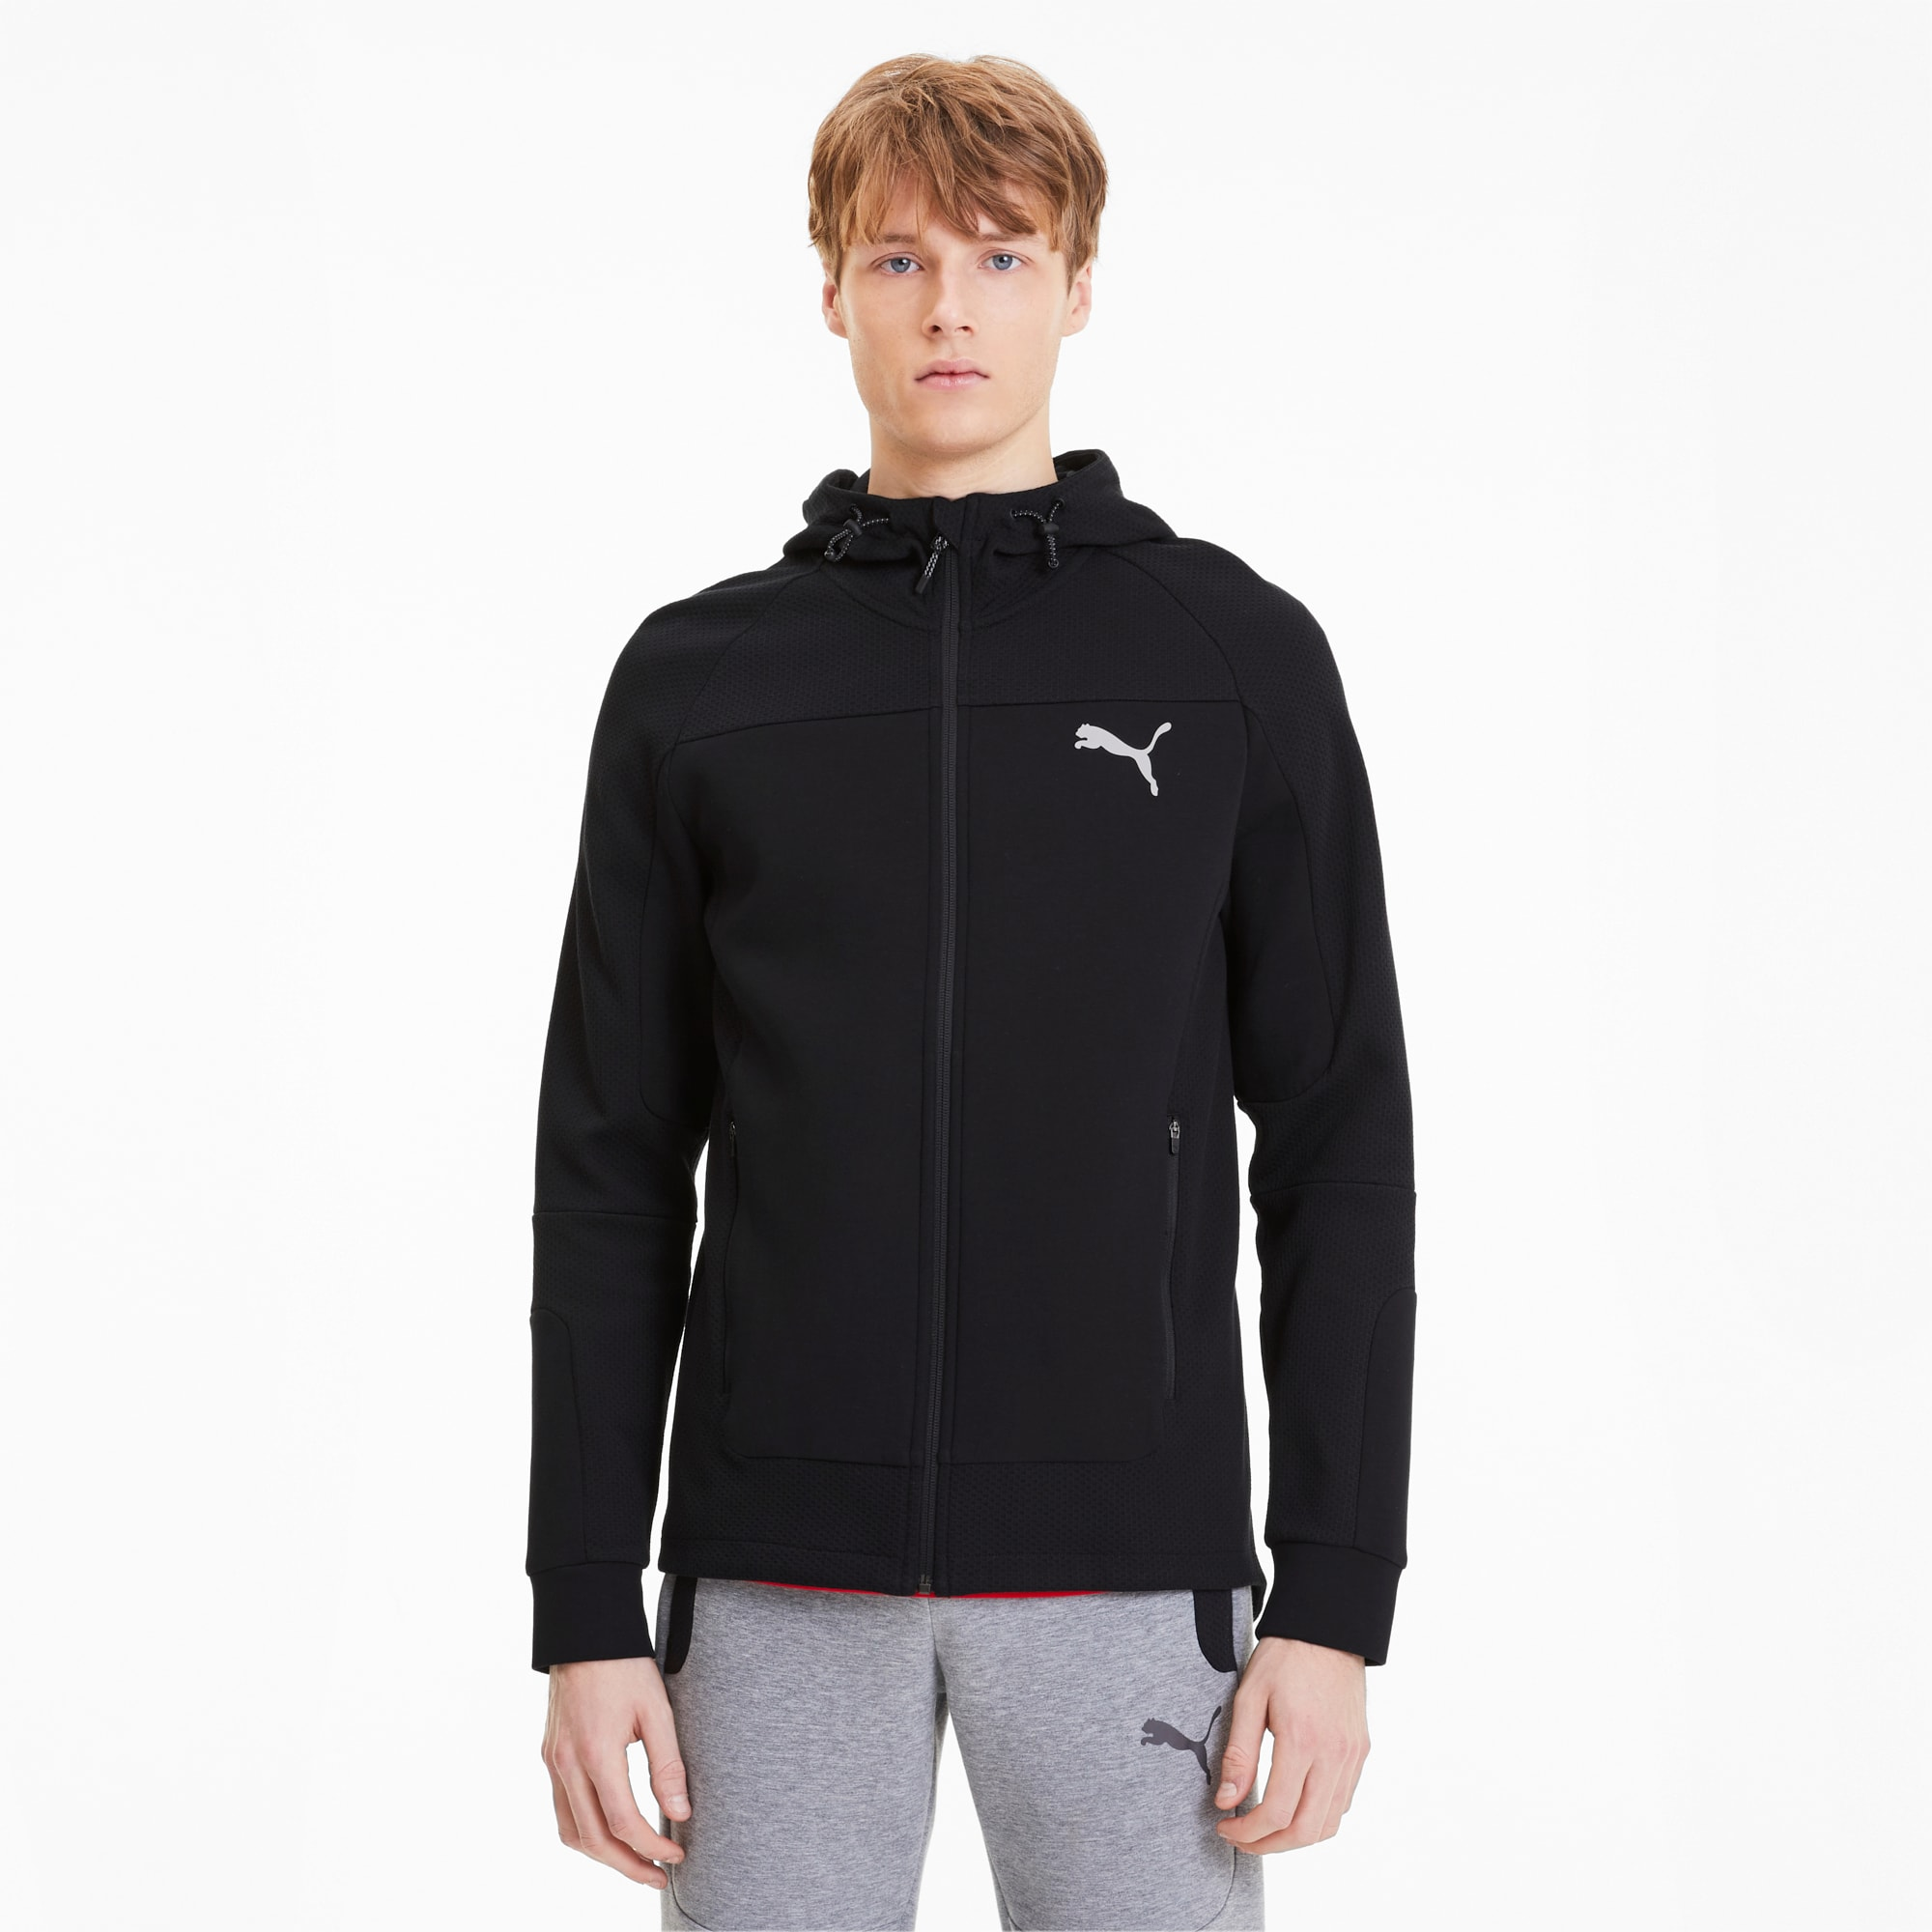 Evostripe Men's Hooded Jacket